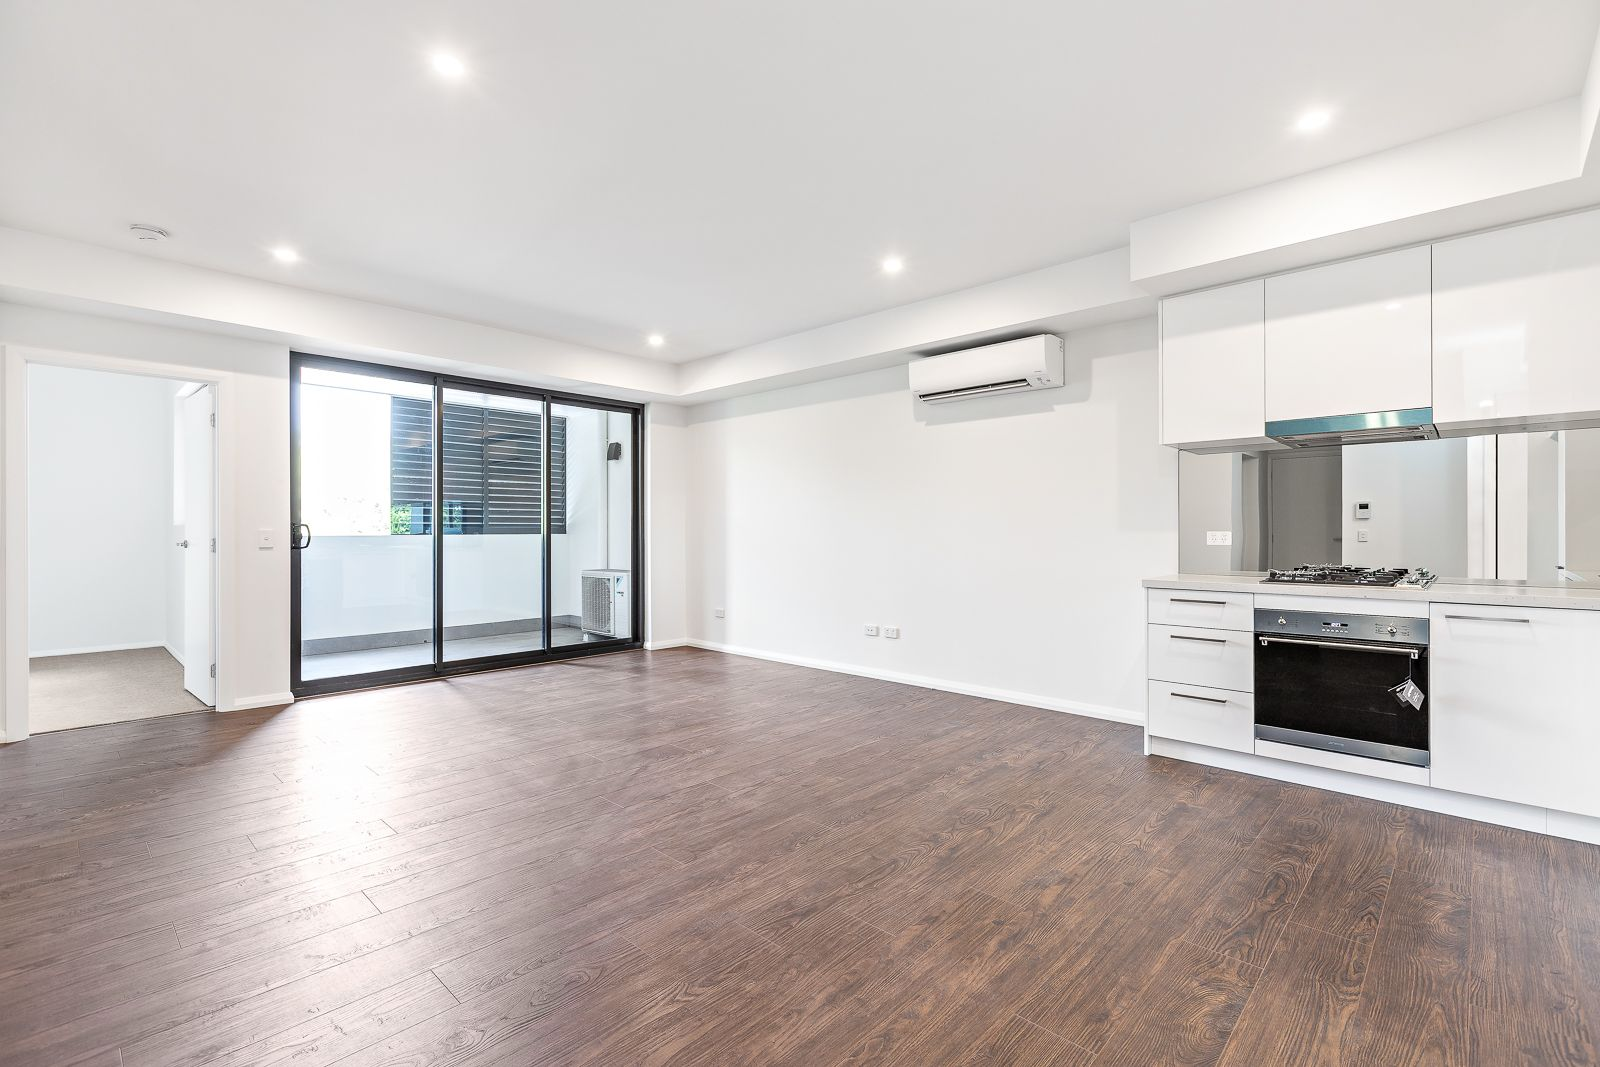 206/37-39 Donald Street, Hamilton NSW 2303, Image 1